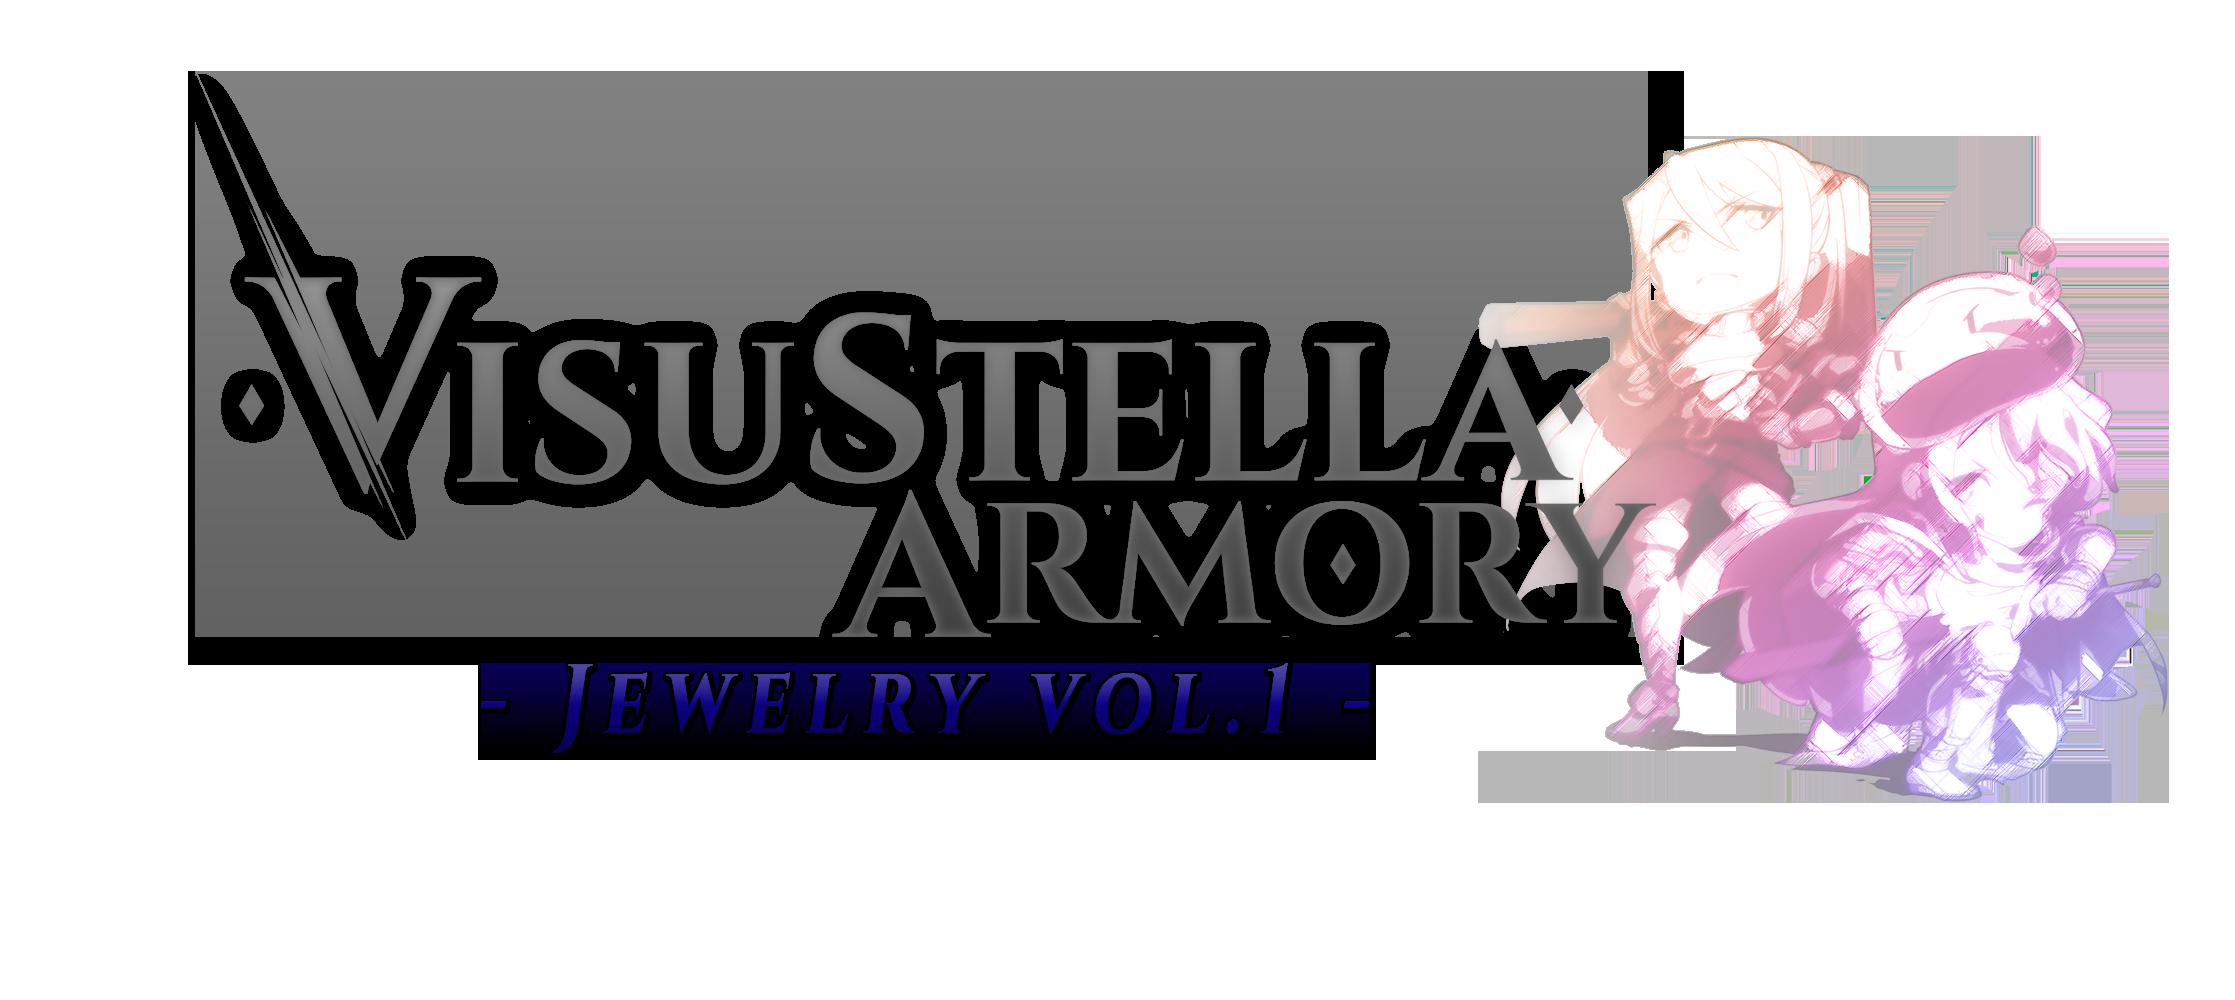 VisuStella Armory: Jewelry Vol.01